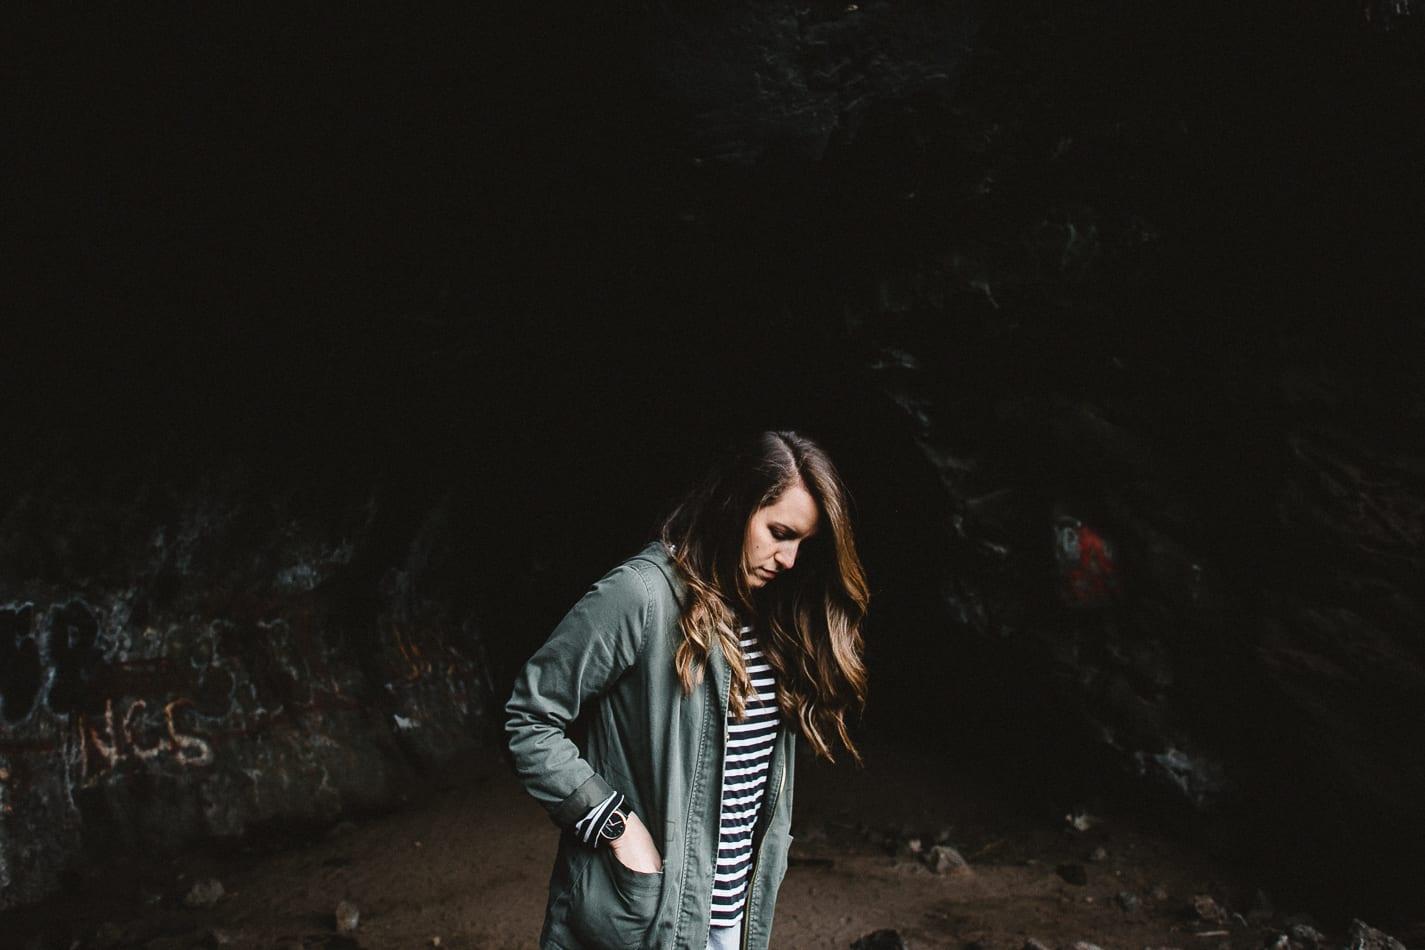 pluto-cave-mount-shasta-lifestyle-portrati-photo-21